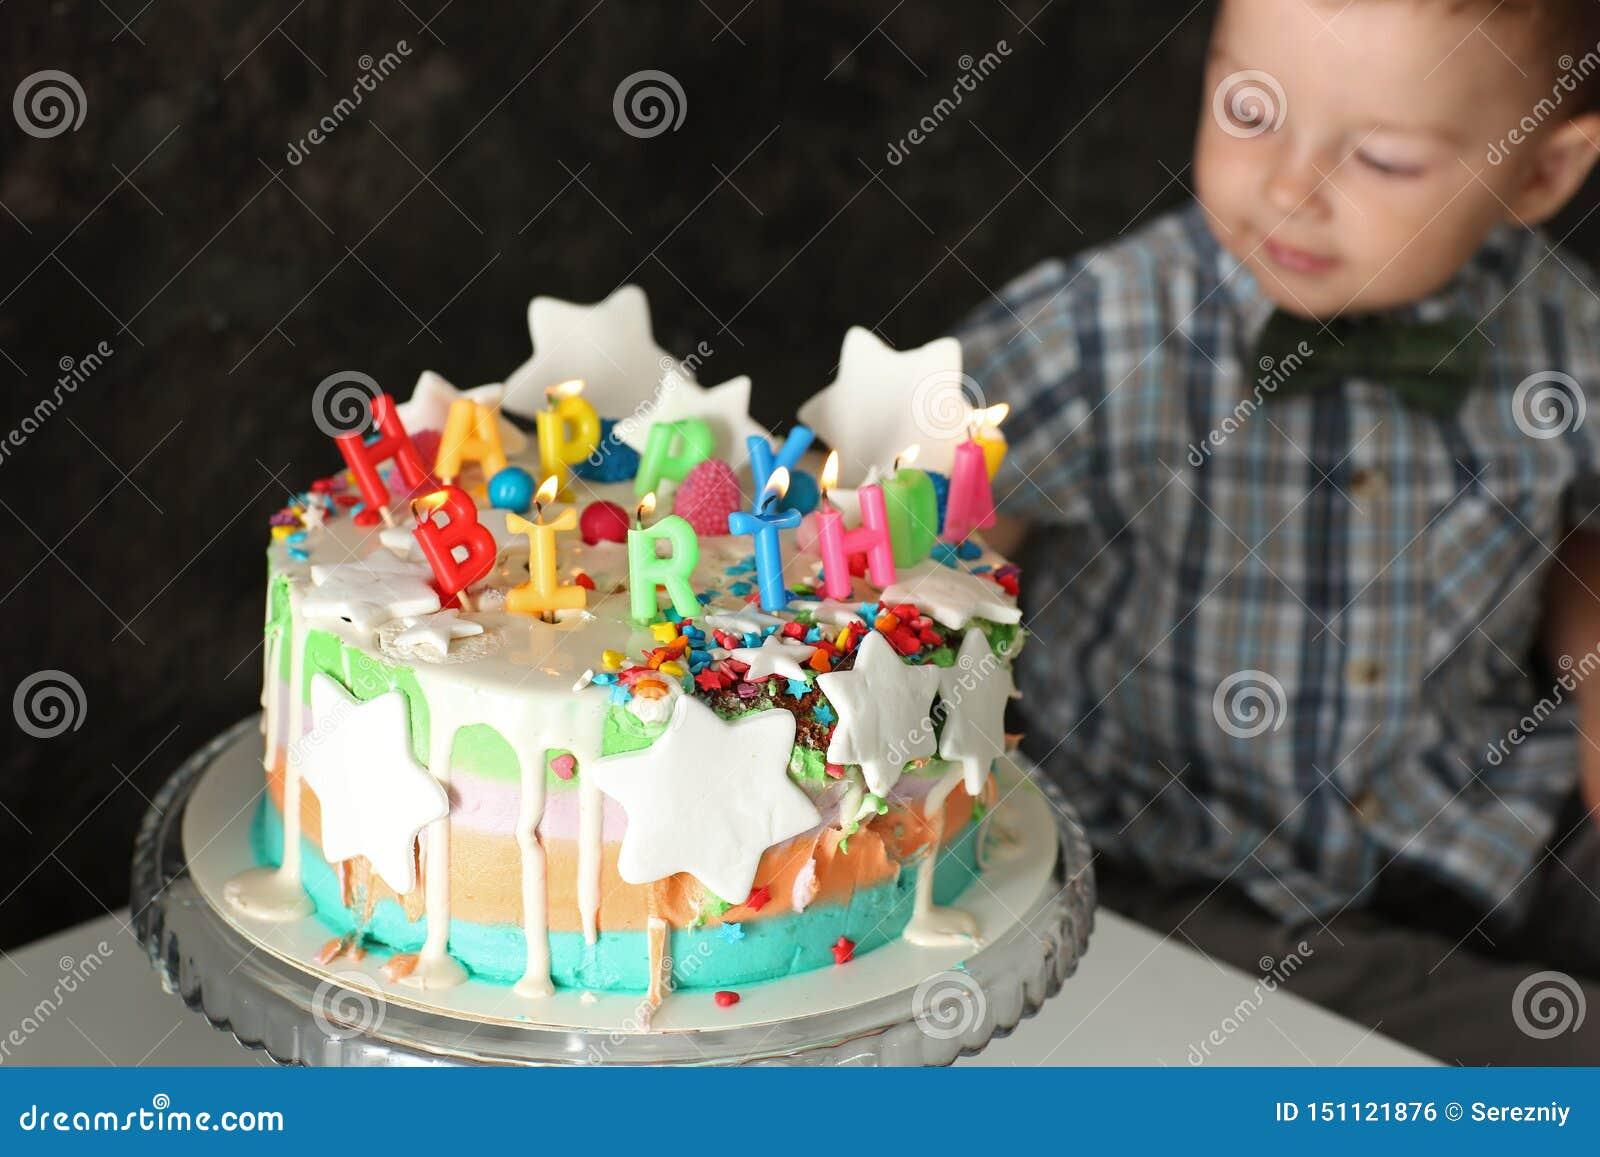 Astounding Cute Little Boy With Birthday Cake Near Grey Wall Stock Photo Funny Birthday Cards Online Inifofree Goldxyz